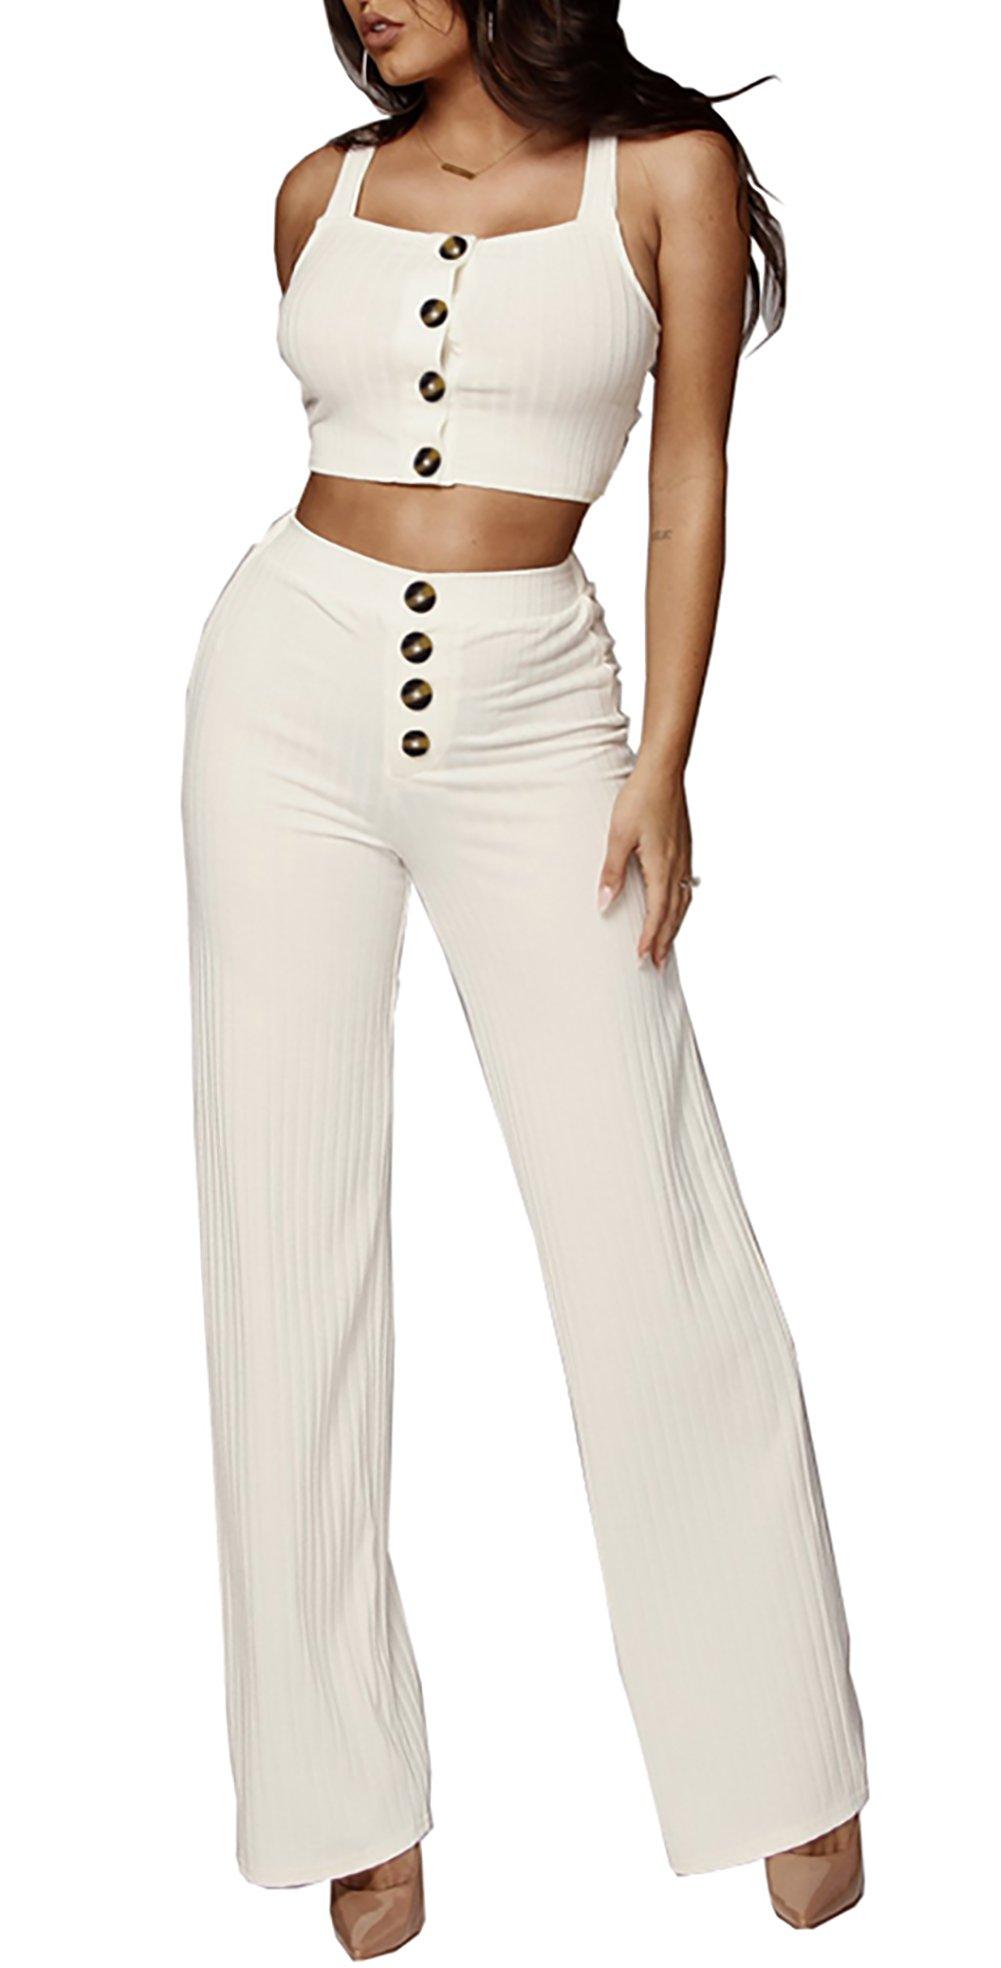 Molisry Women's Retro 2 Pieces Outfits Spaghetti Strap Crop Tops & Wide Leg Long Pants Rompers